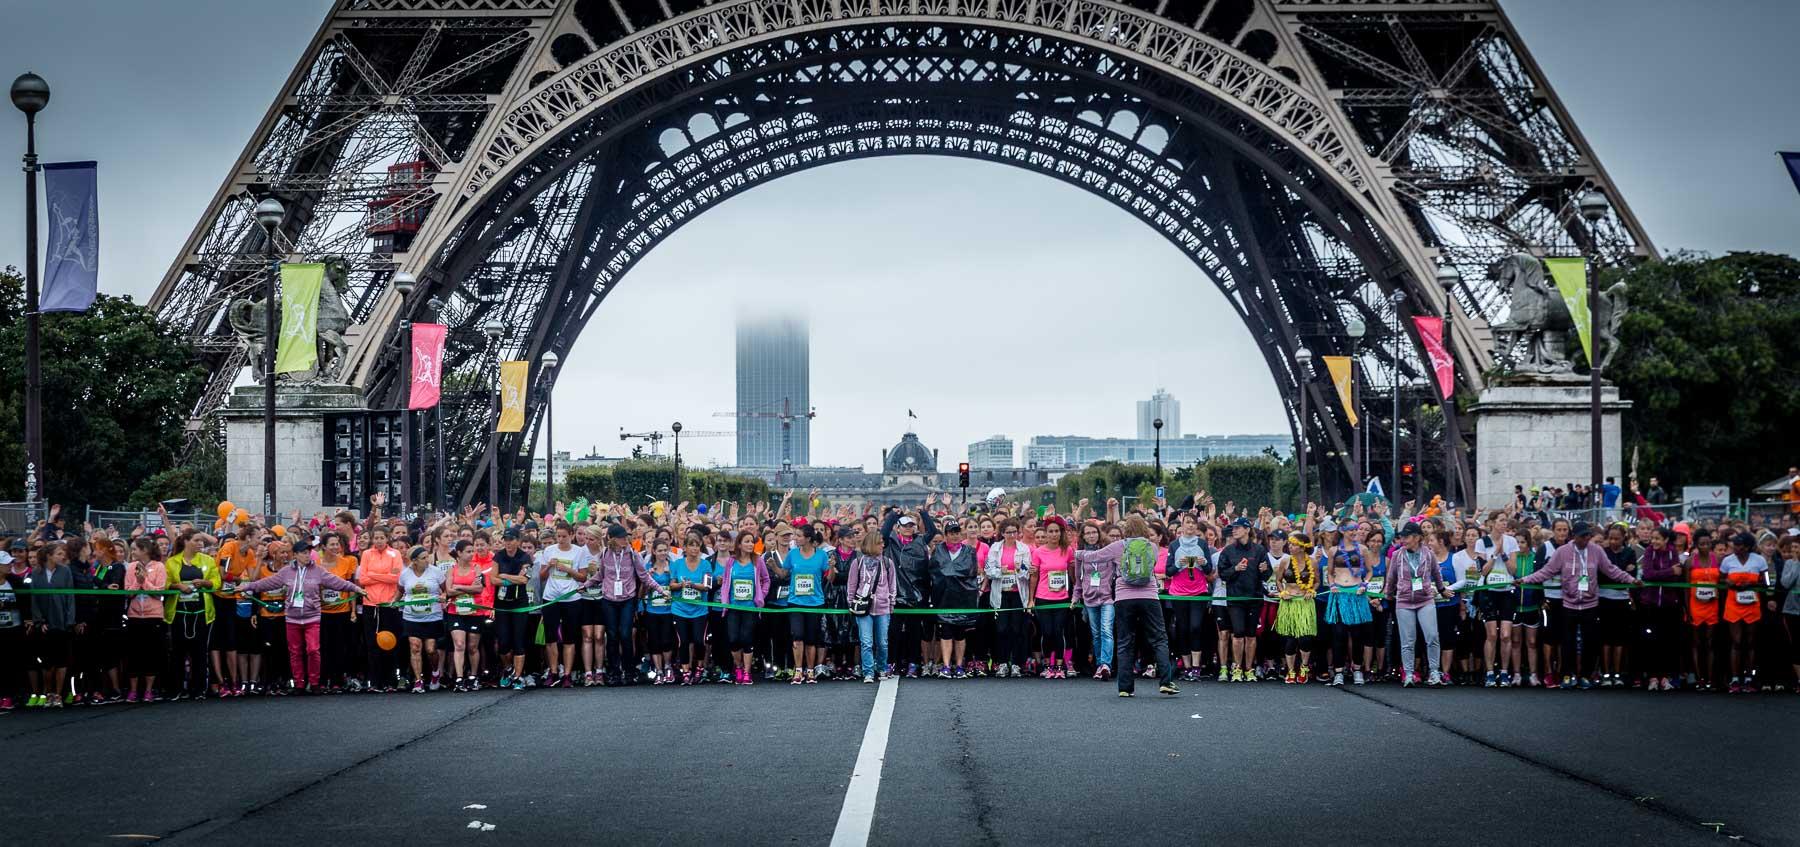 Yann Renoard Photographe La Parisienne